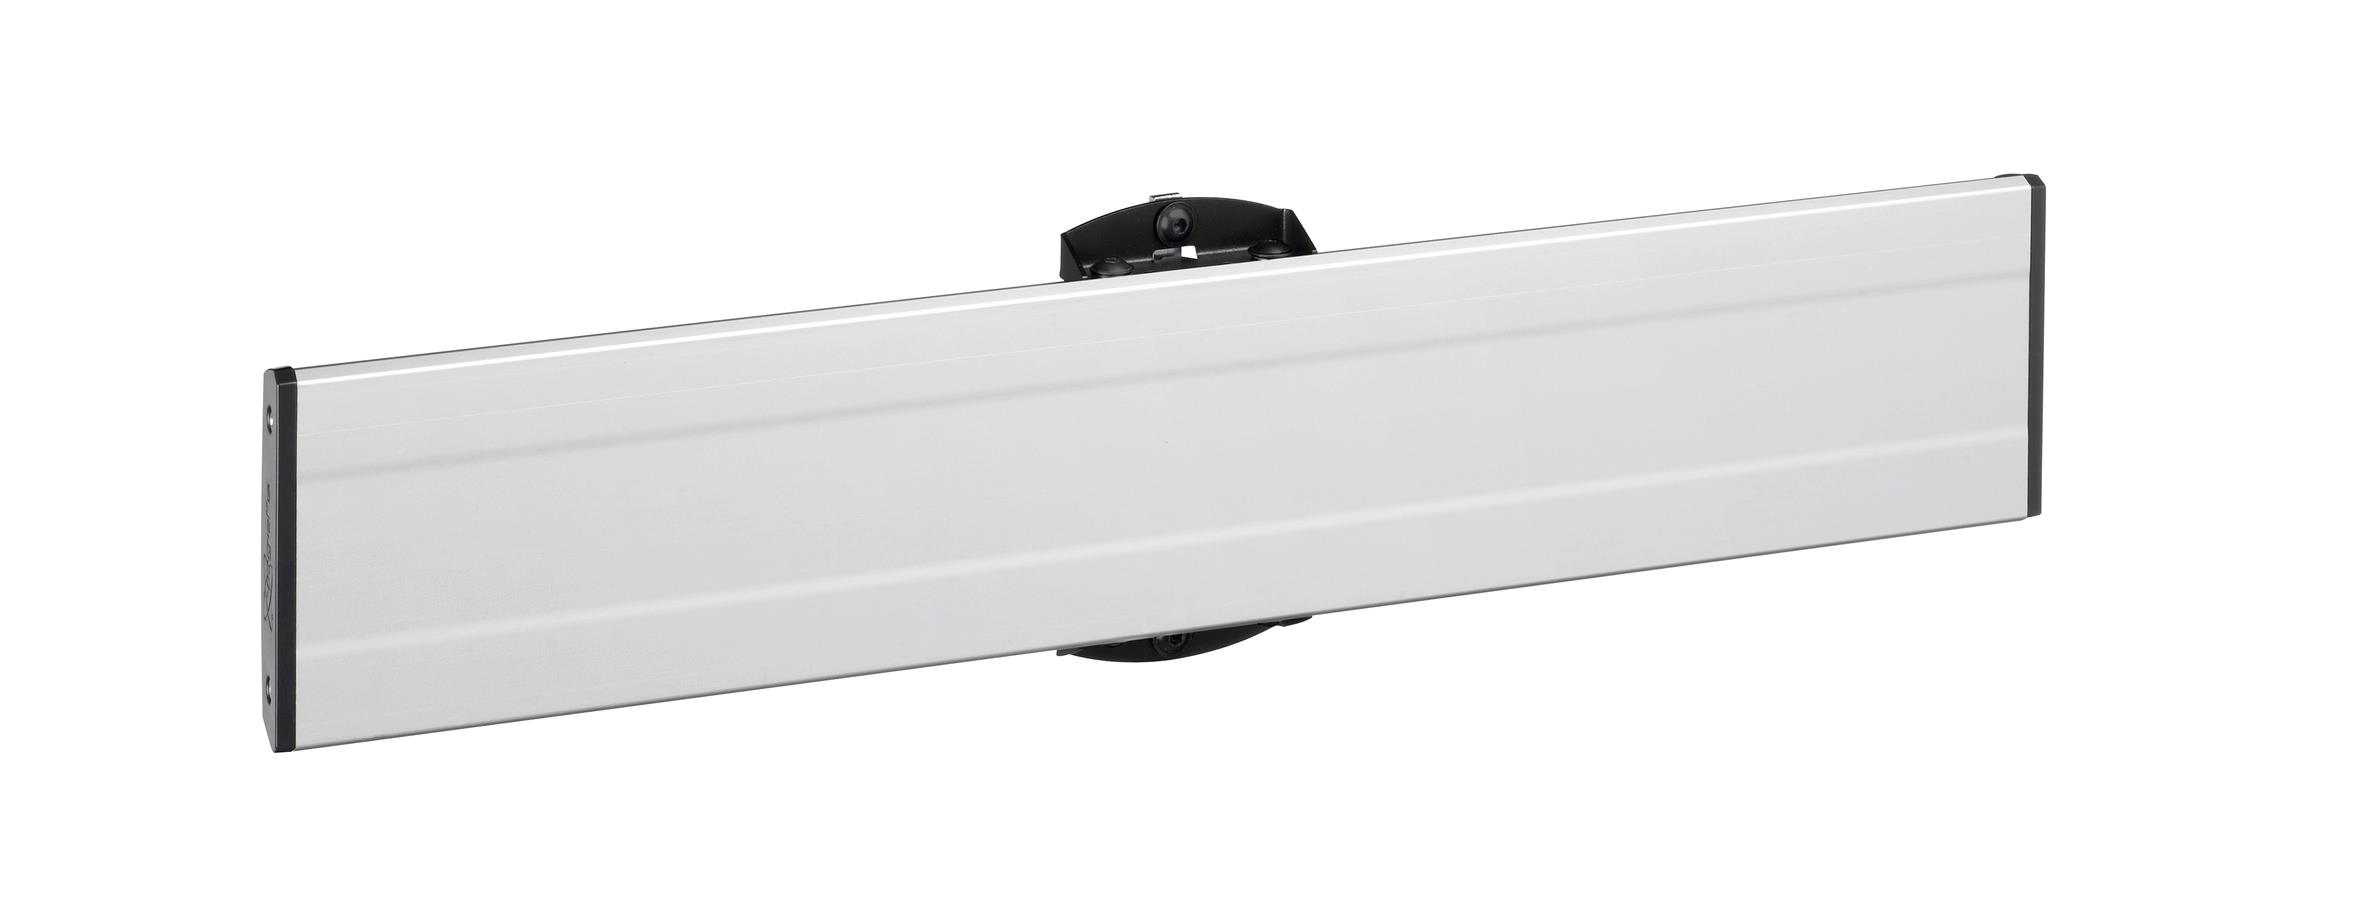 Vogels PFB 3407 Interface Bar 715mm (Silver)